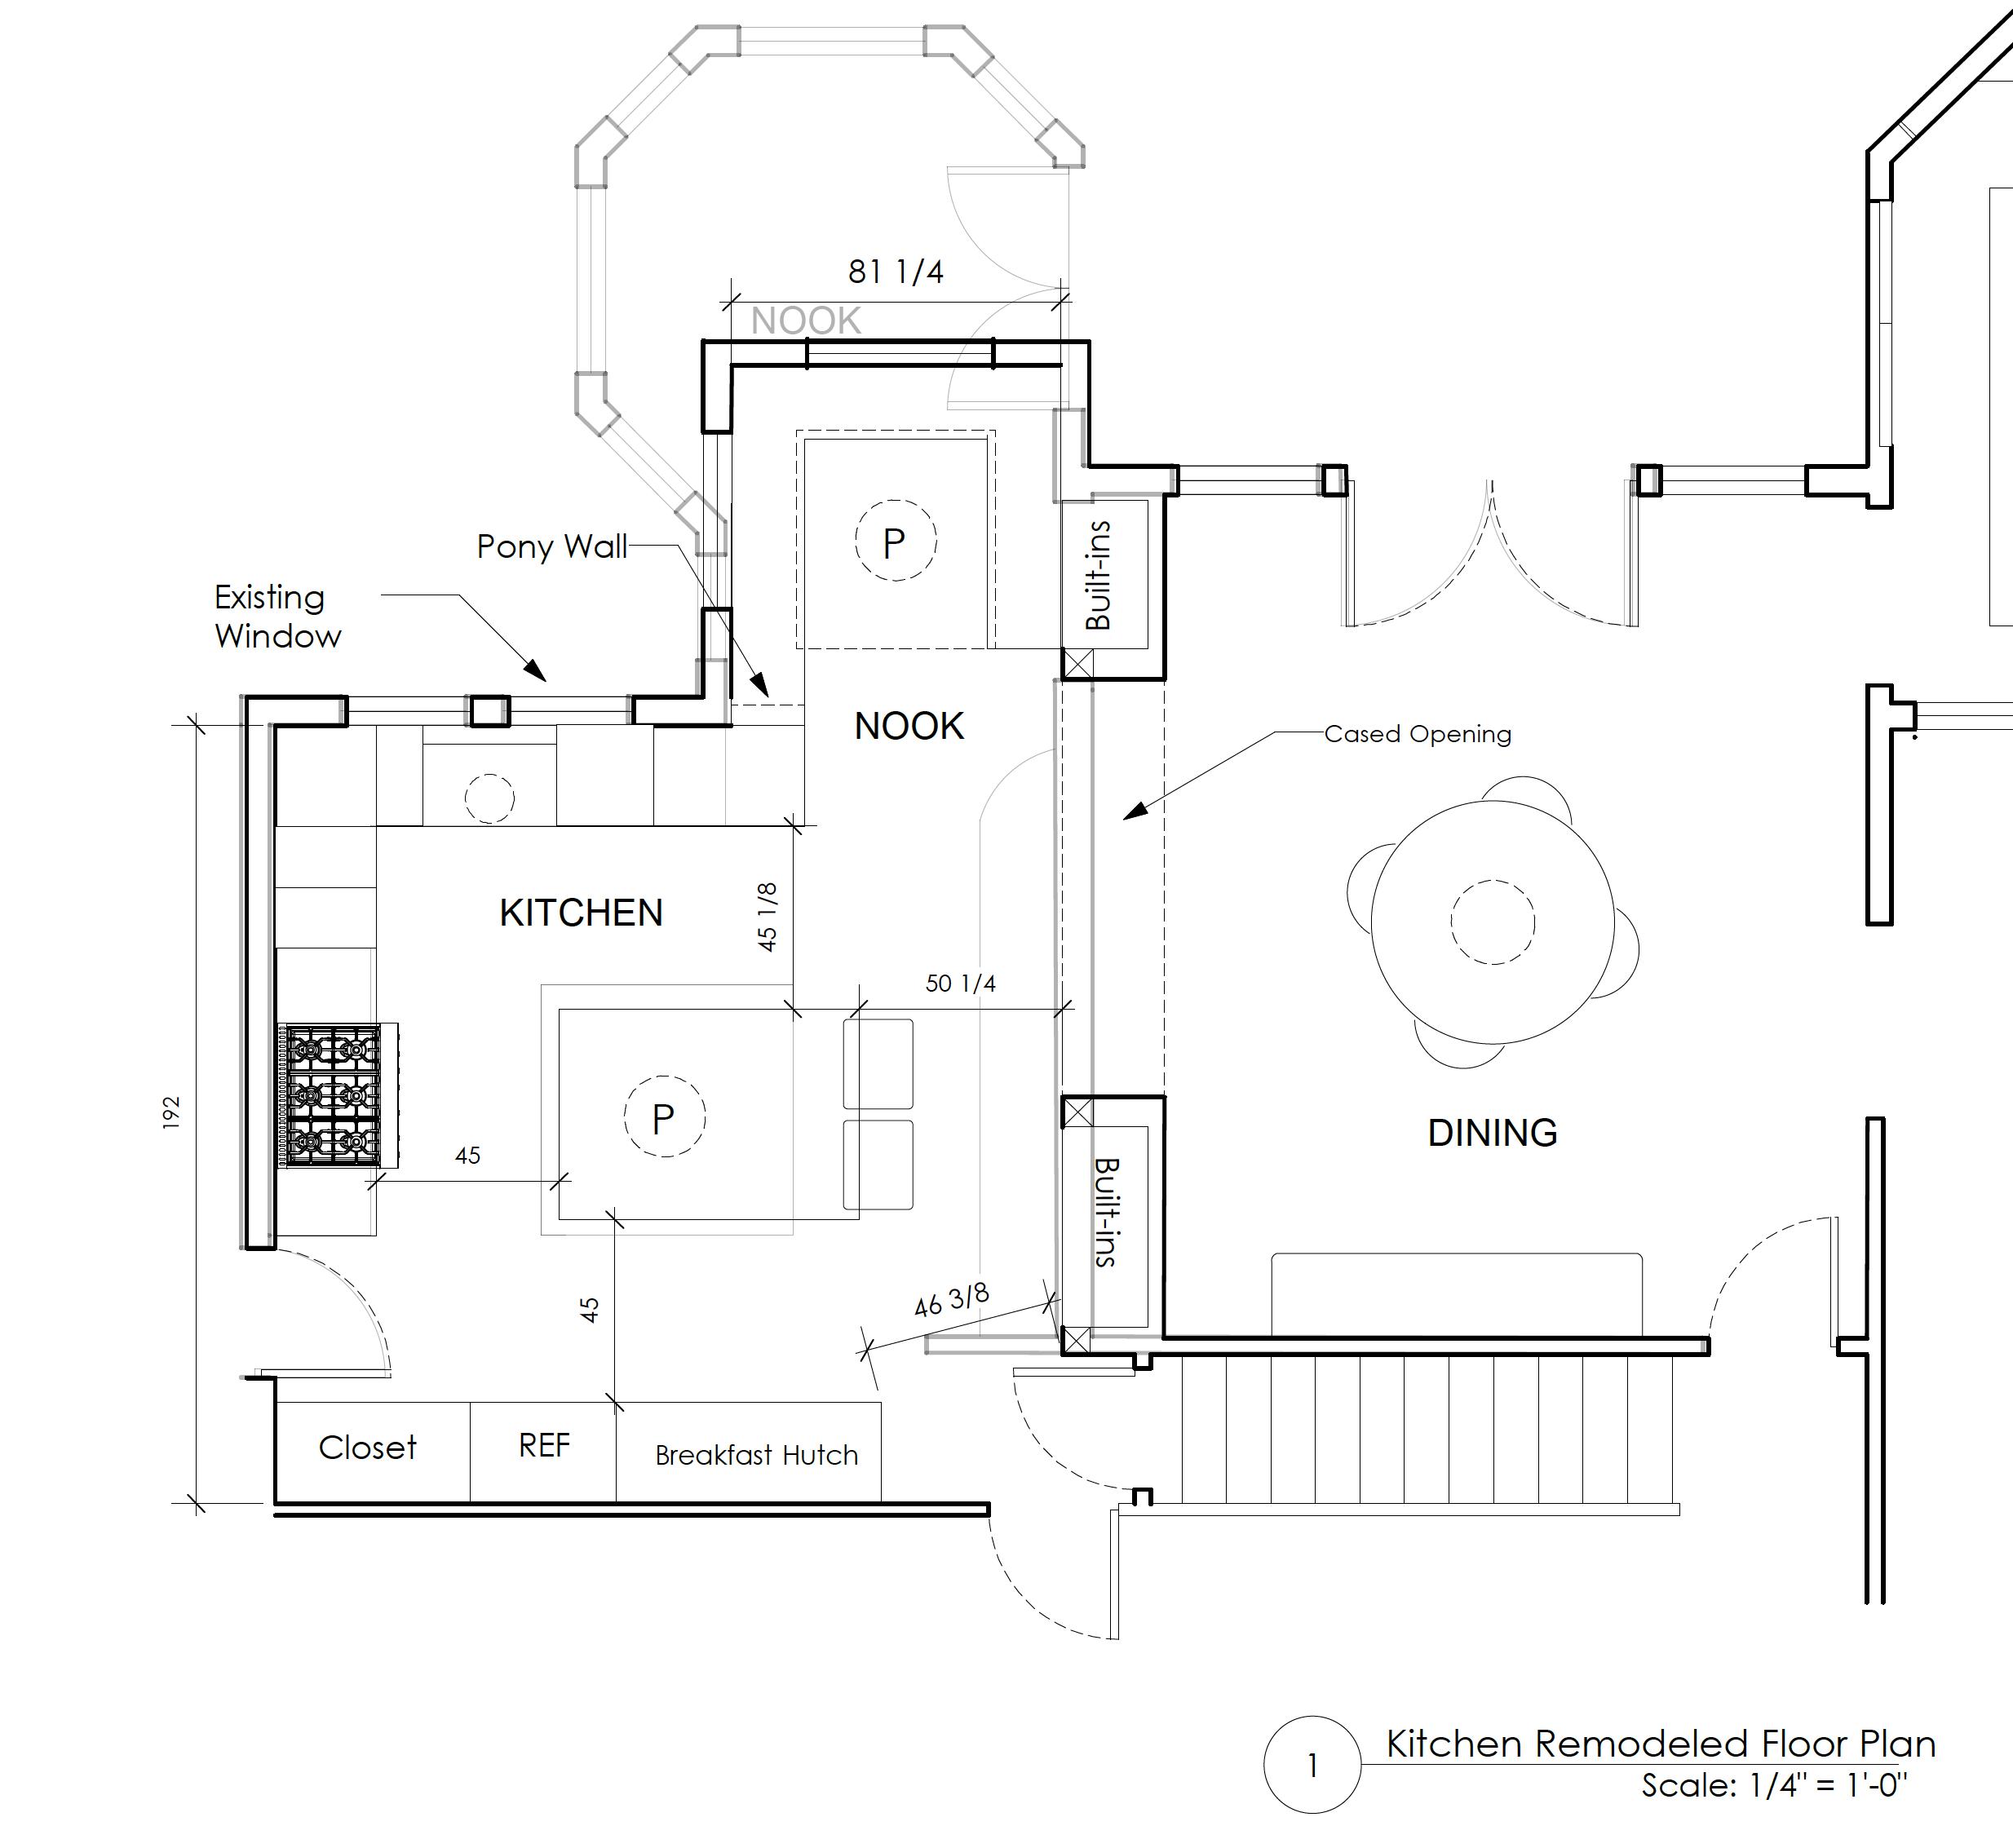 Kitchen remodel floor plan by Jenni Leasia Interior Design in Portland